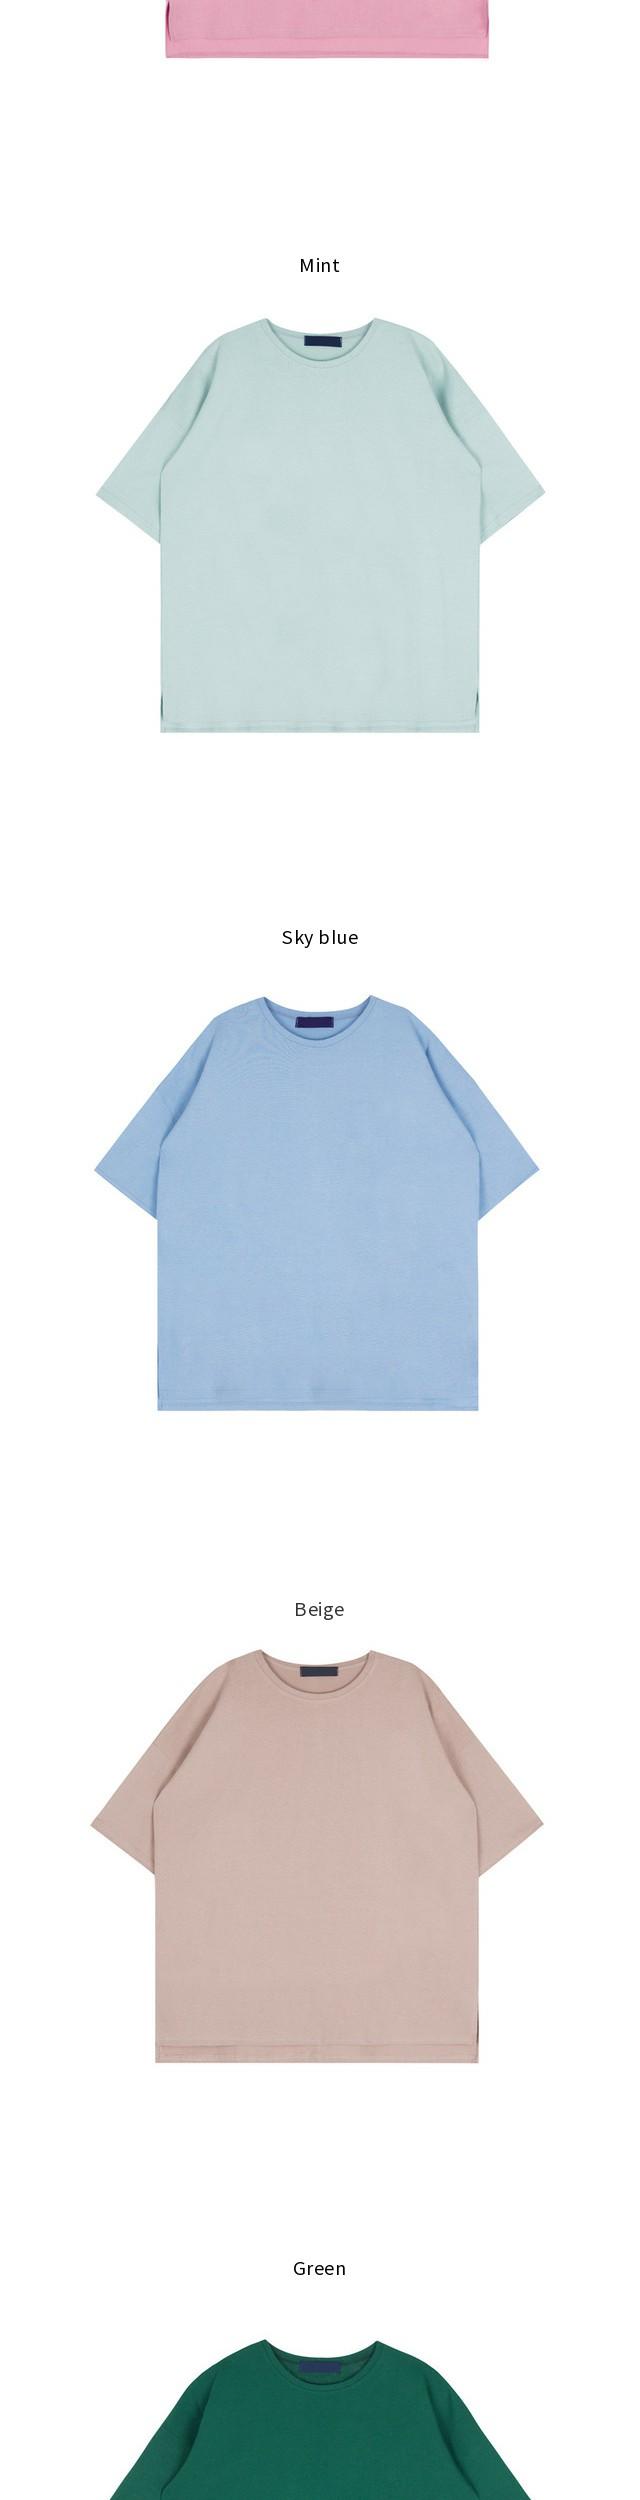 Winnie Daily T-shirt 2 pieces Buy 20000 won